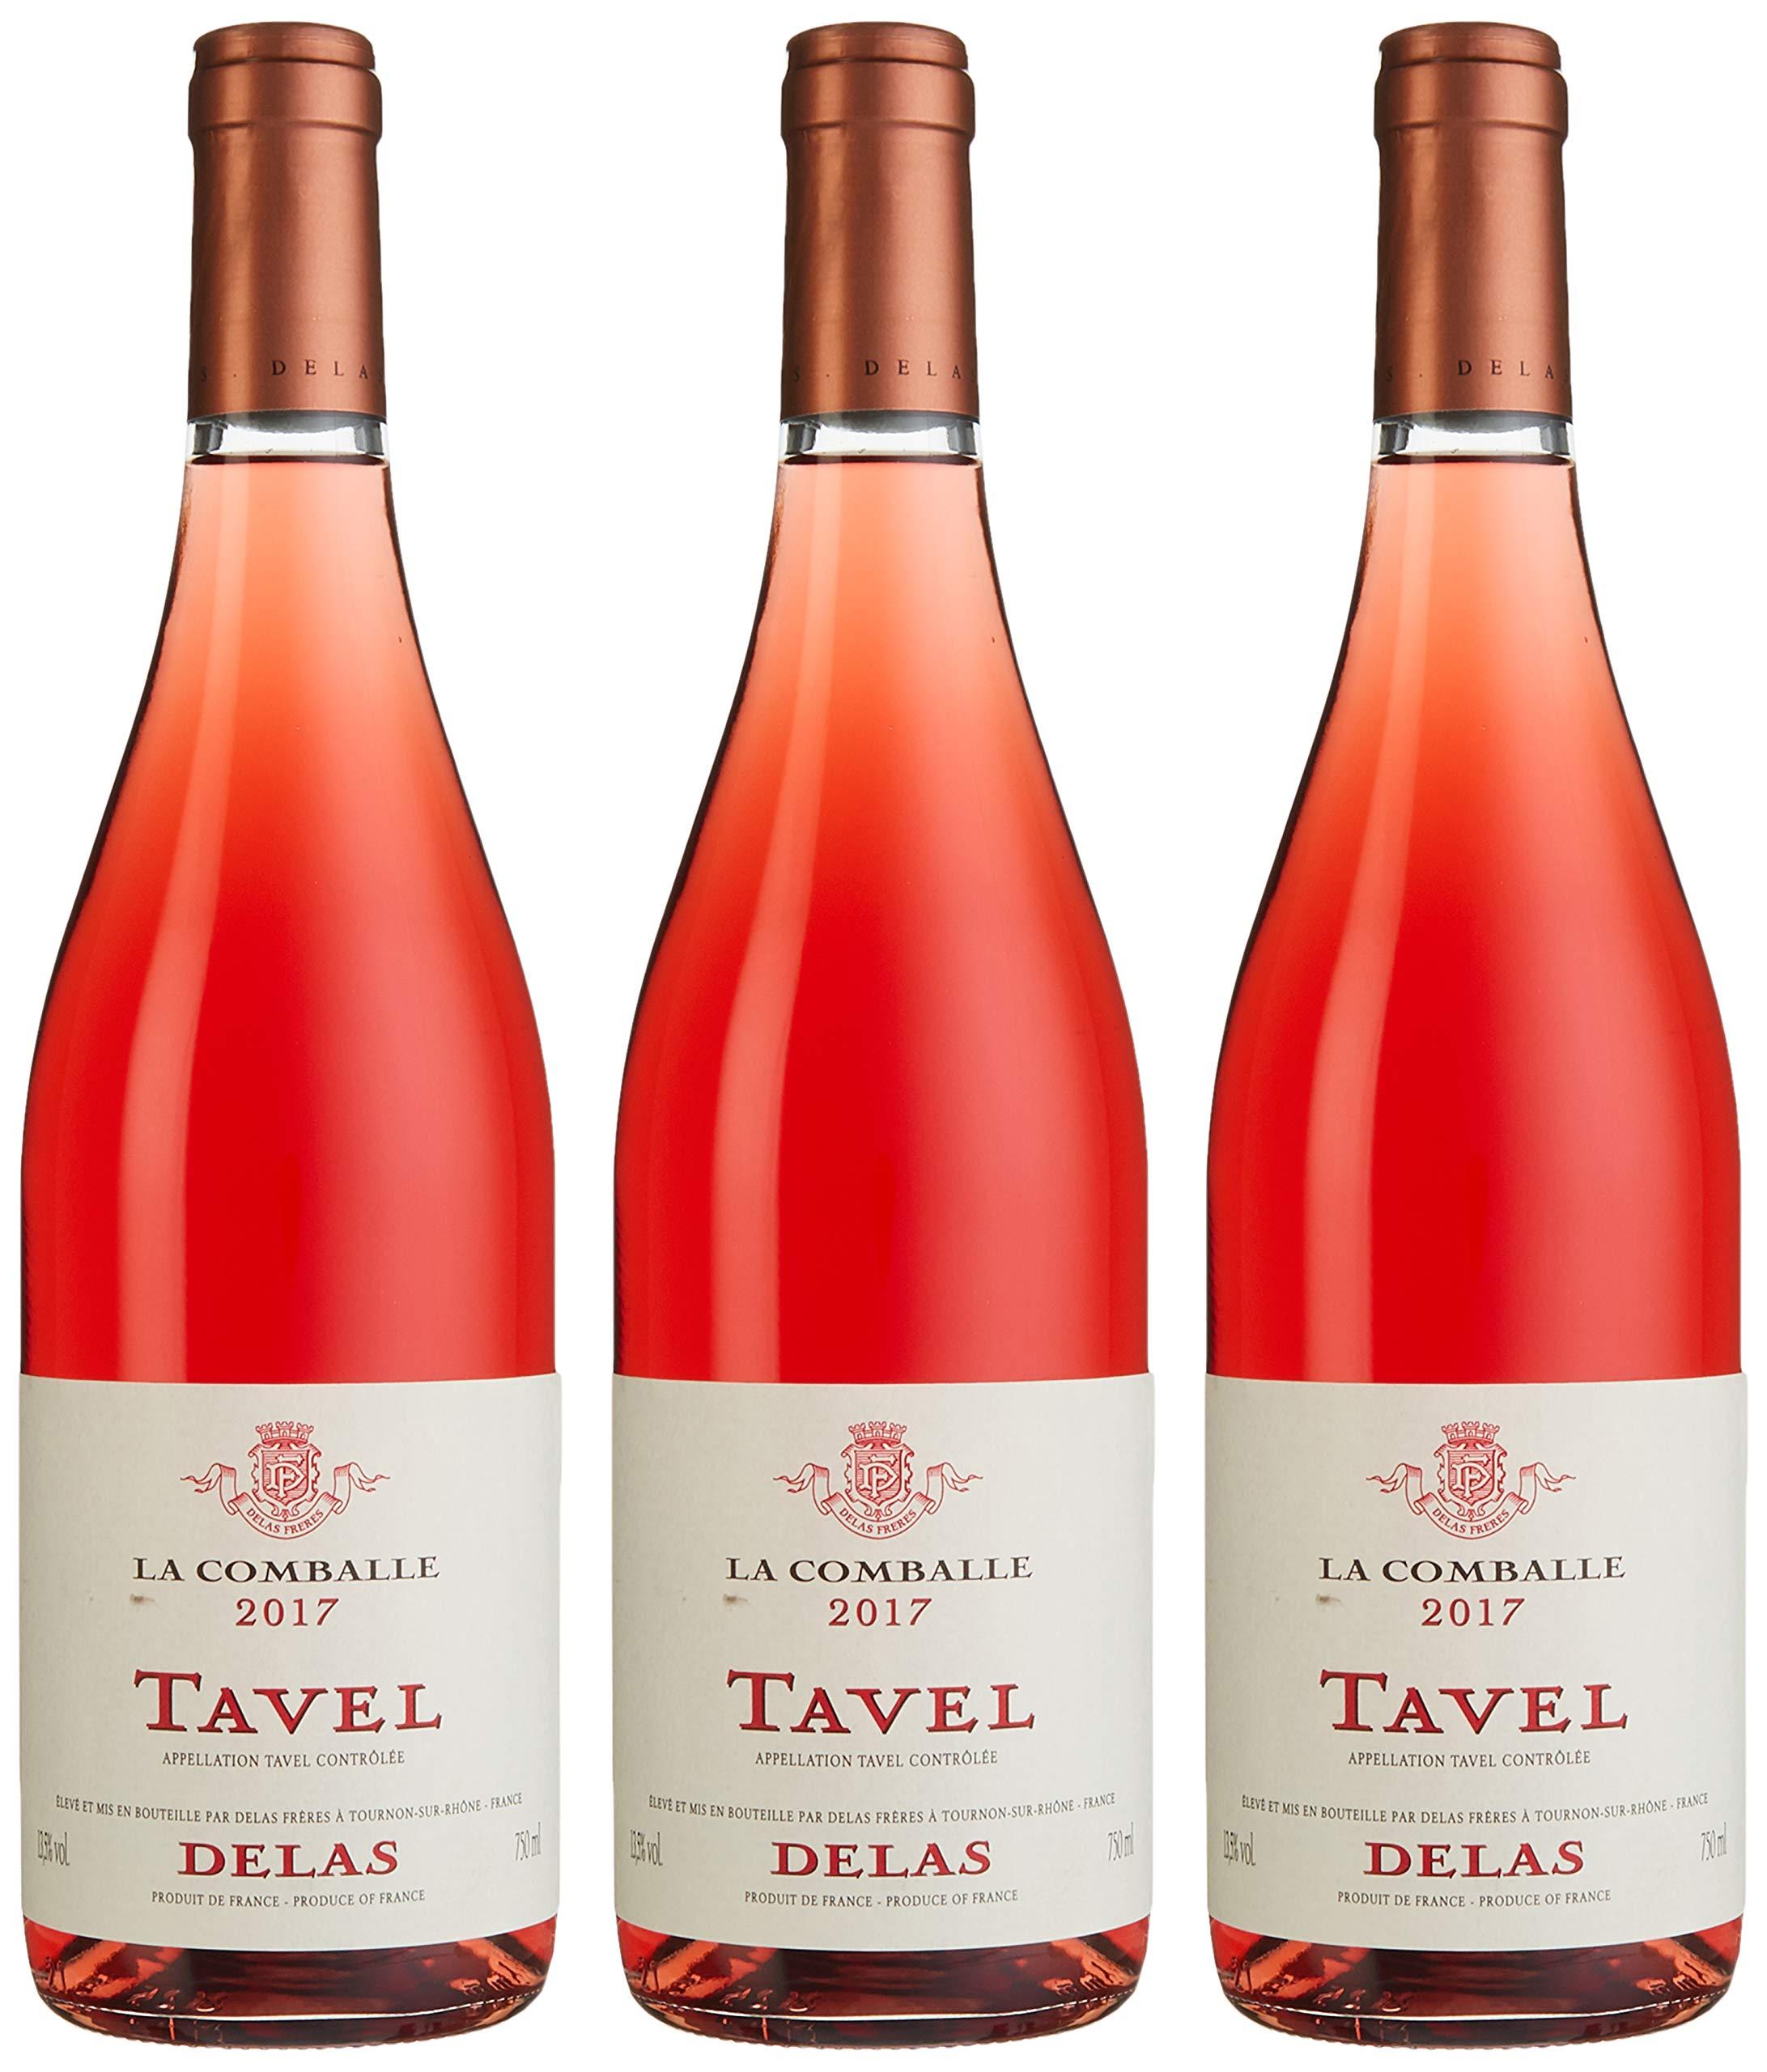 Delas-Tavel-La-Comballe-Ros-2017-3er-pack-3-x-075-l